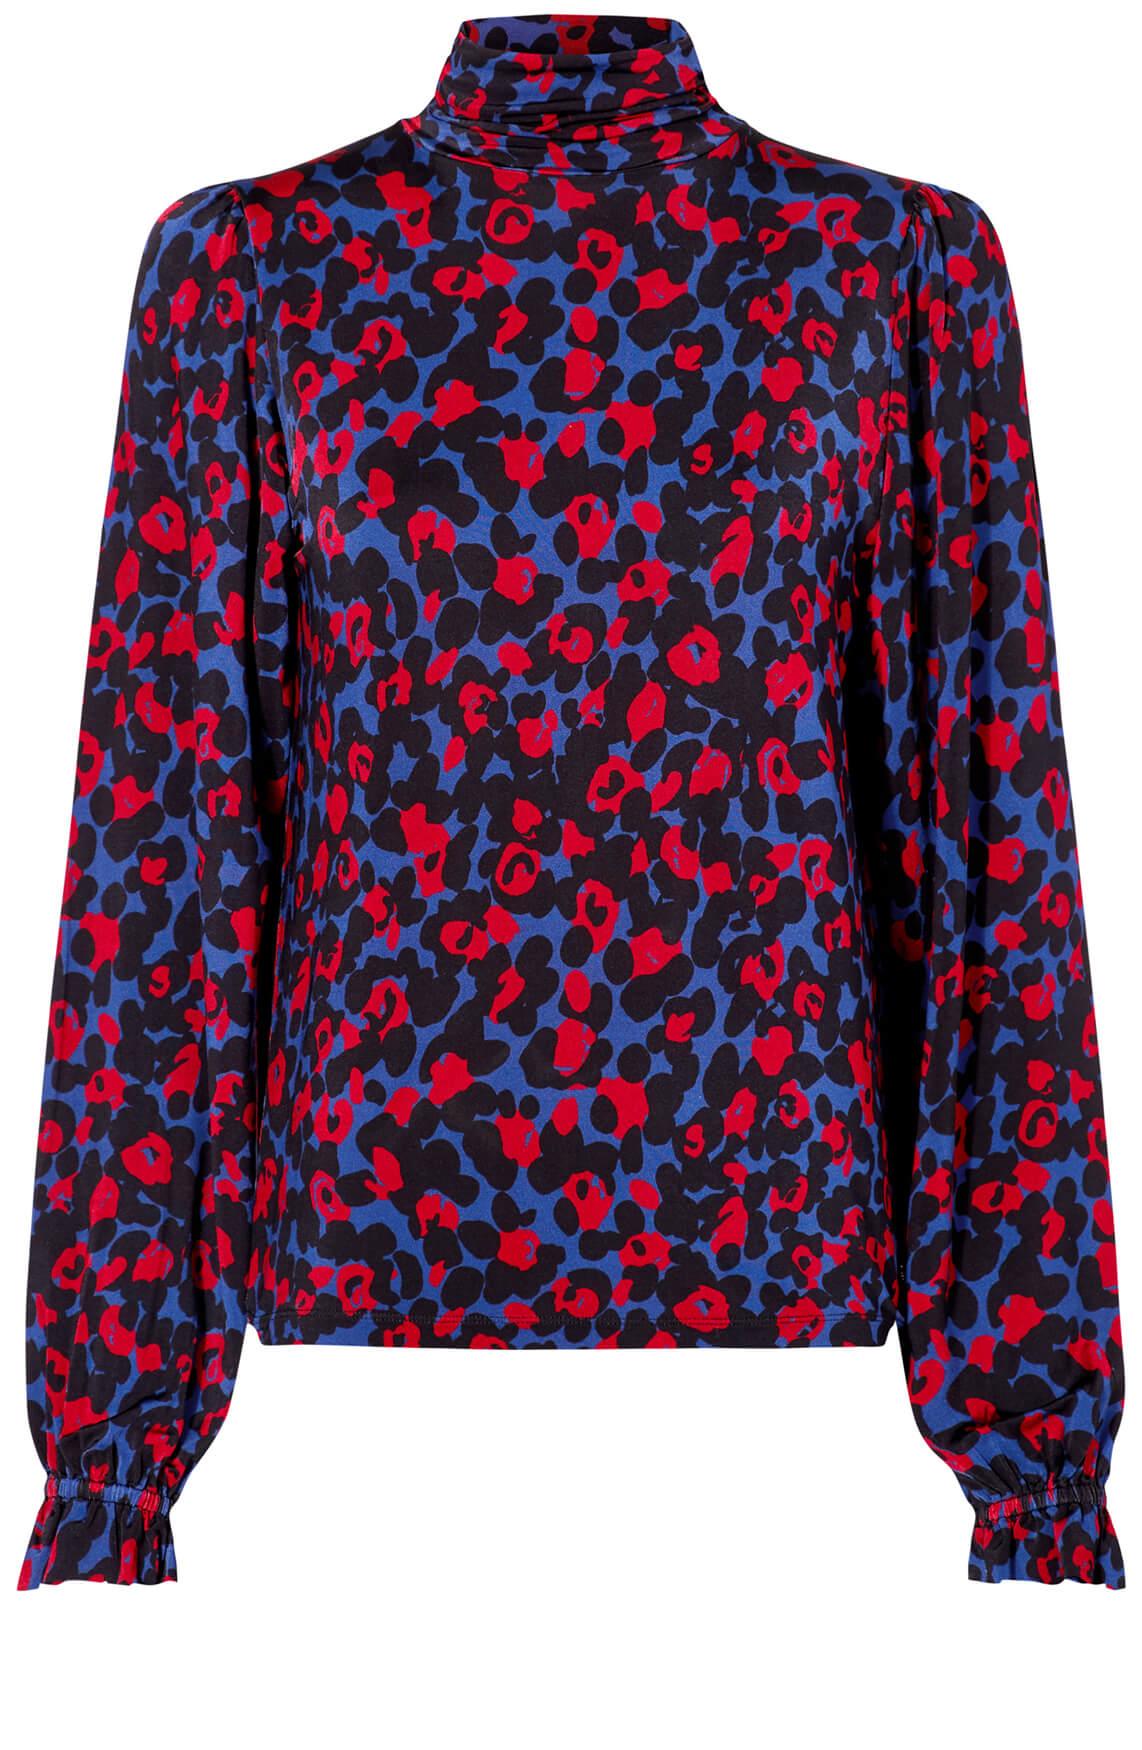 Fabienne Chapot Dames Billy shirt met pofmouwen Blauw